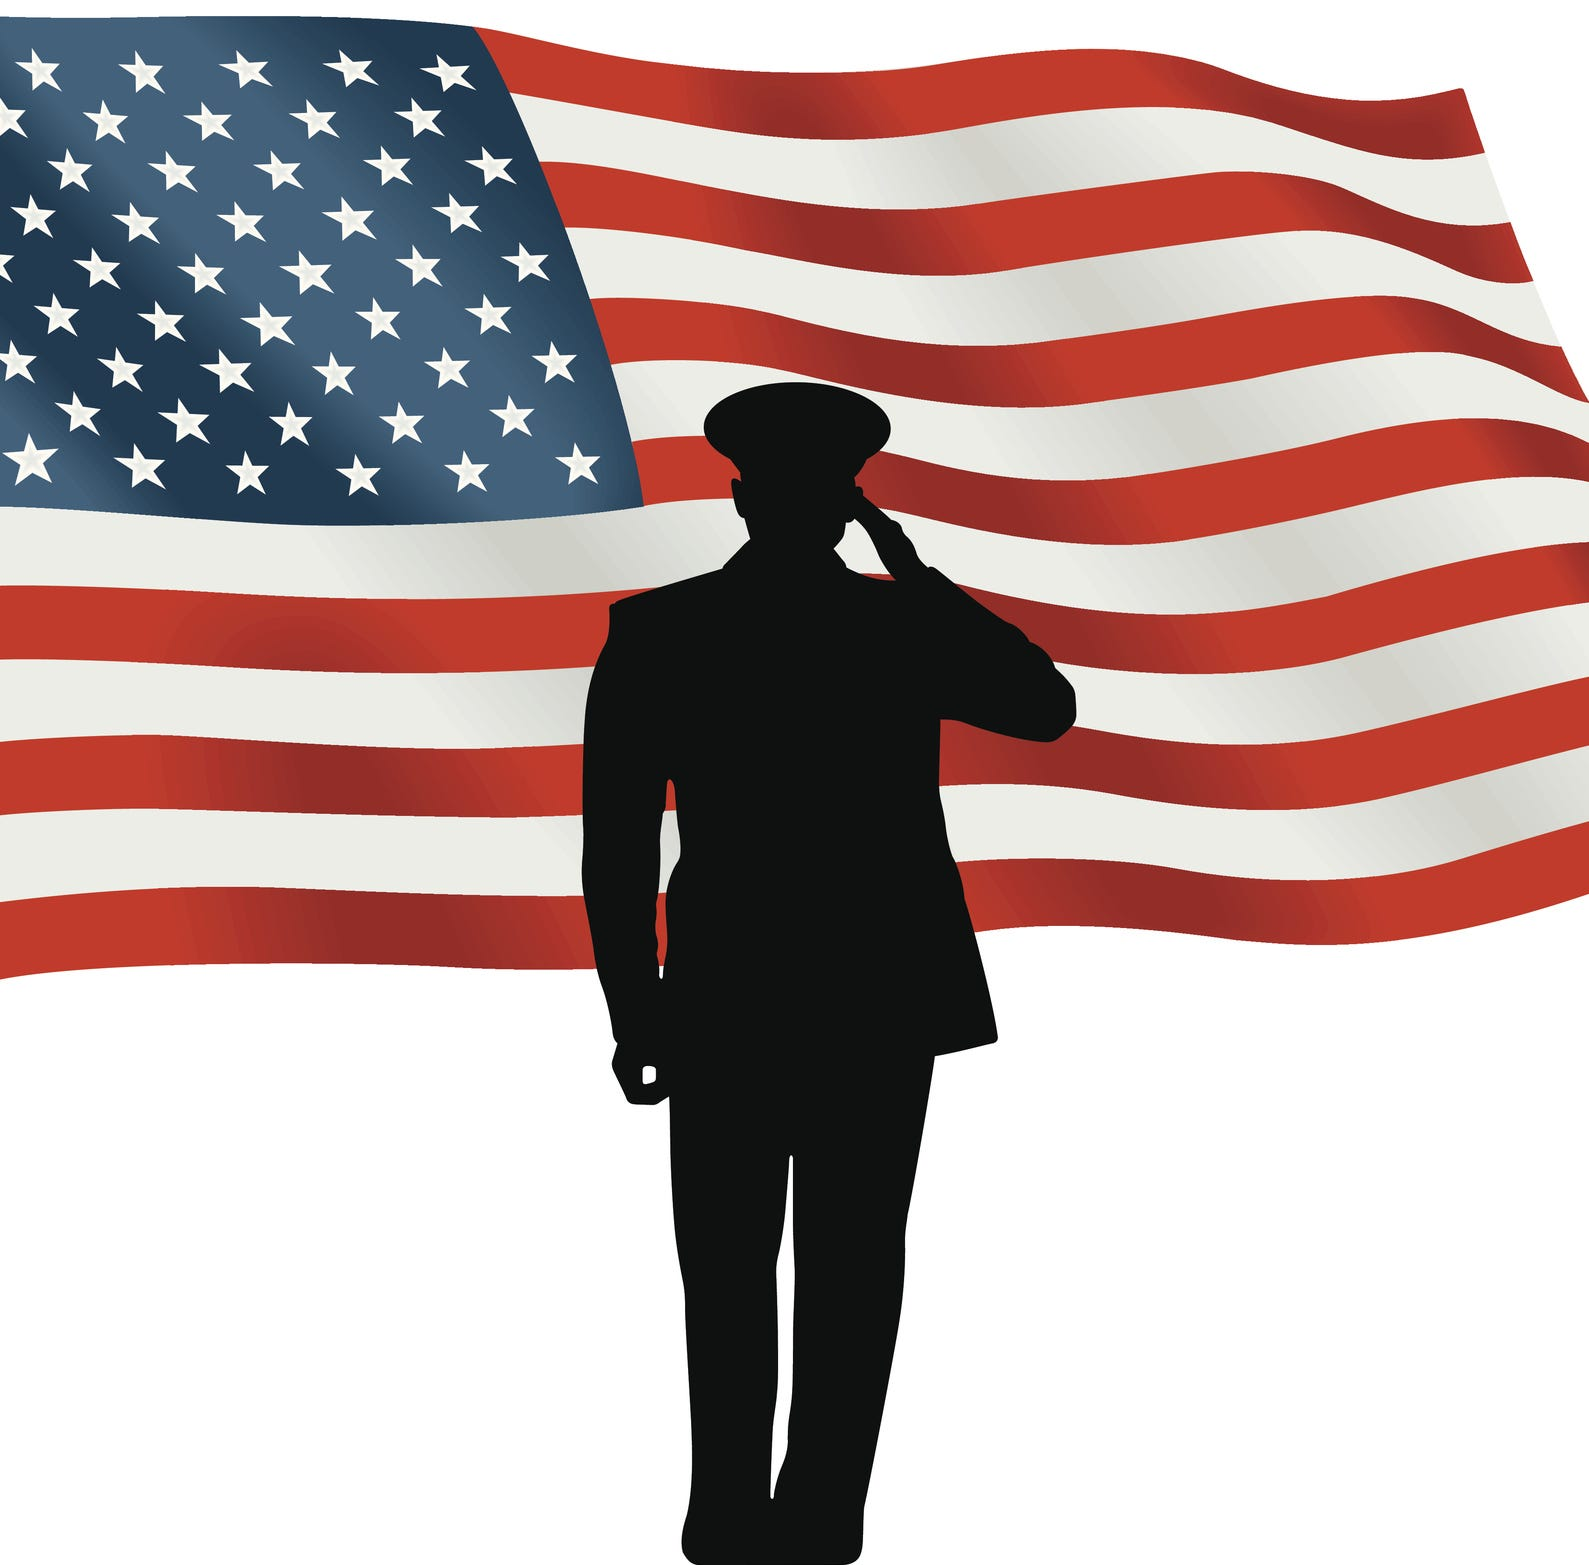 Millville announces 9/11 ceremony